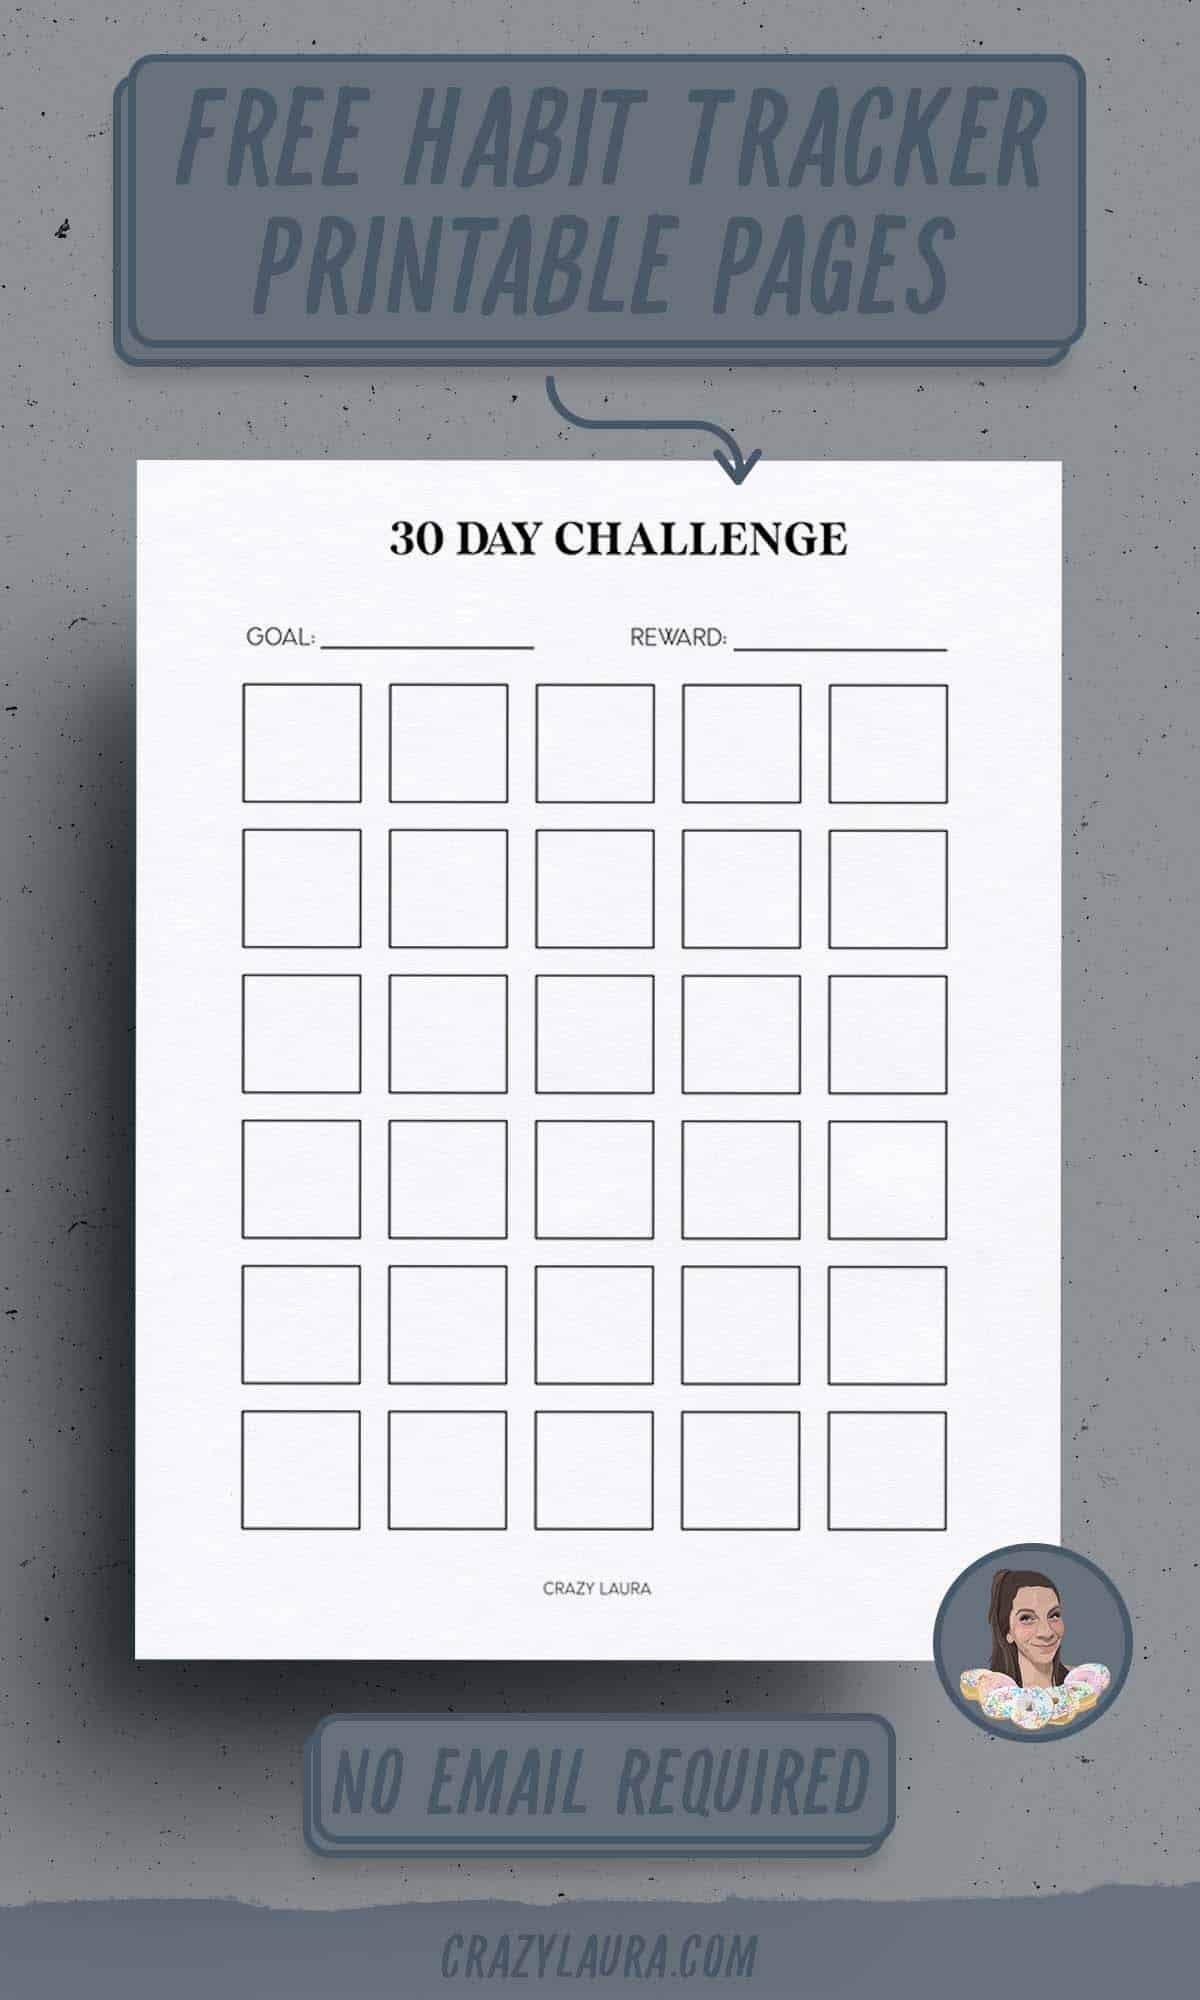 30 day challenge tracker